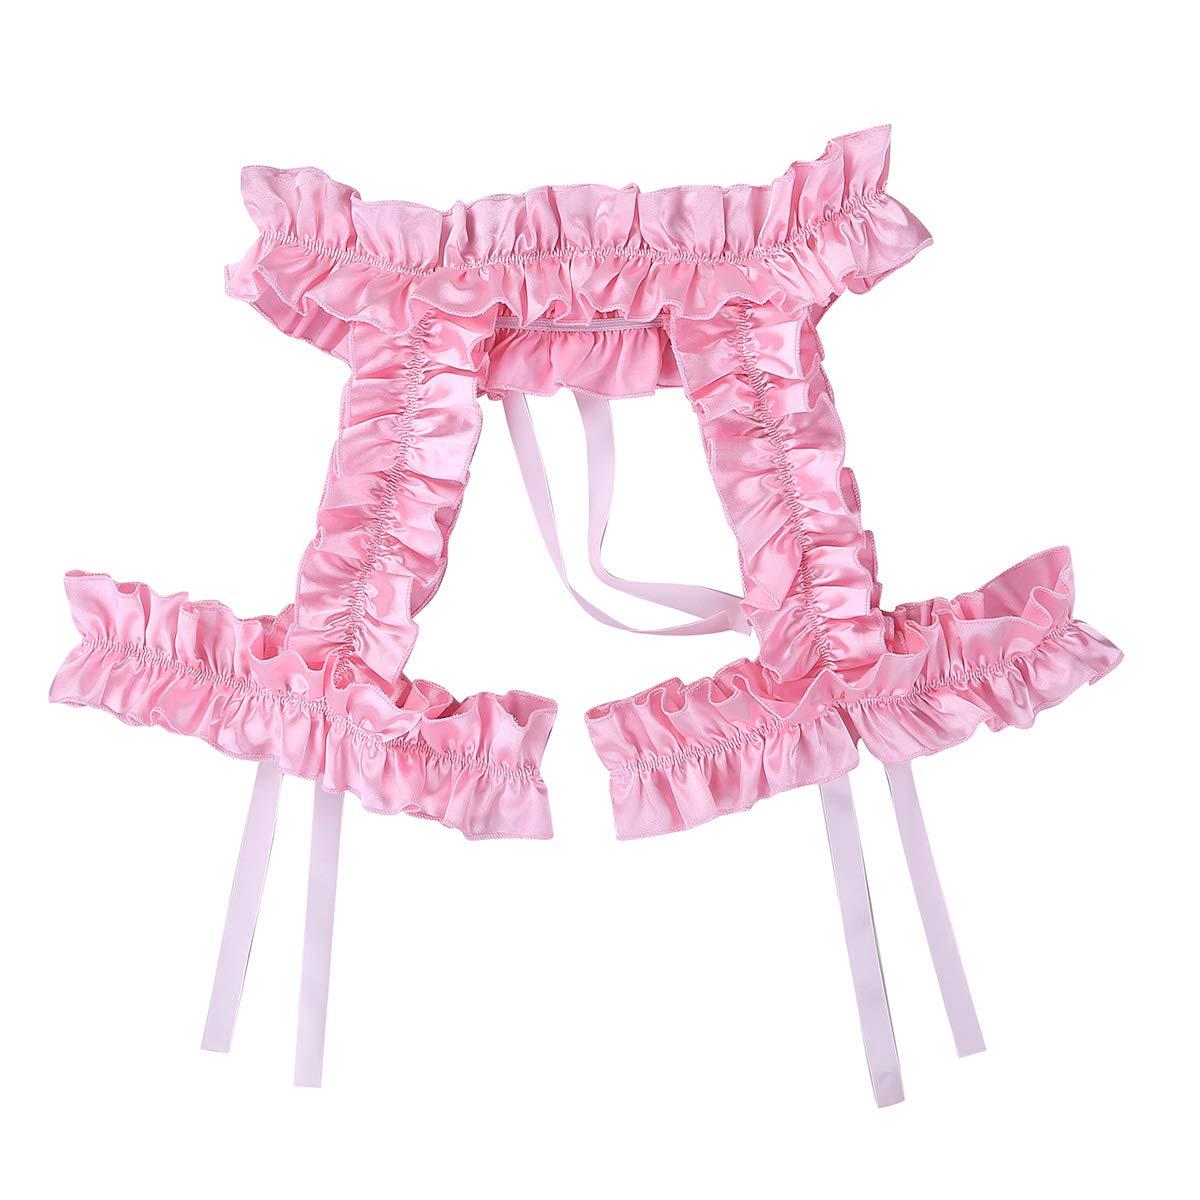 CHICTRY Mens Garter Underwear Frilly Satin Sissy Hollowed Suspender Trunk Belts